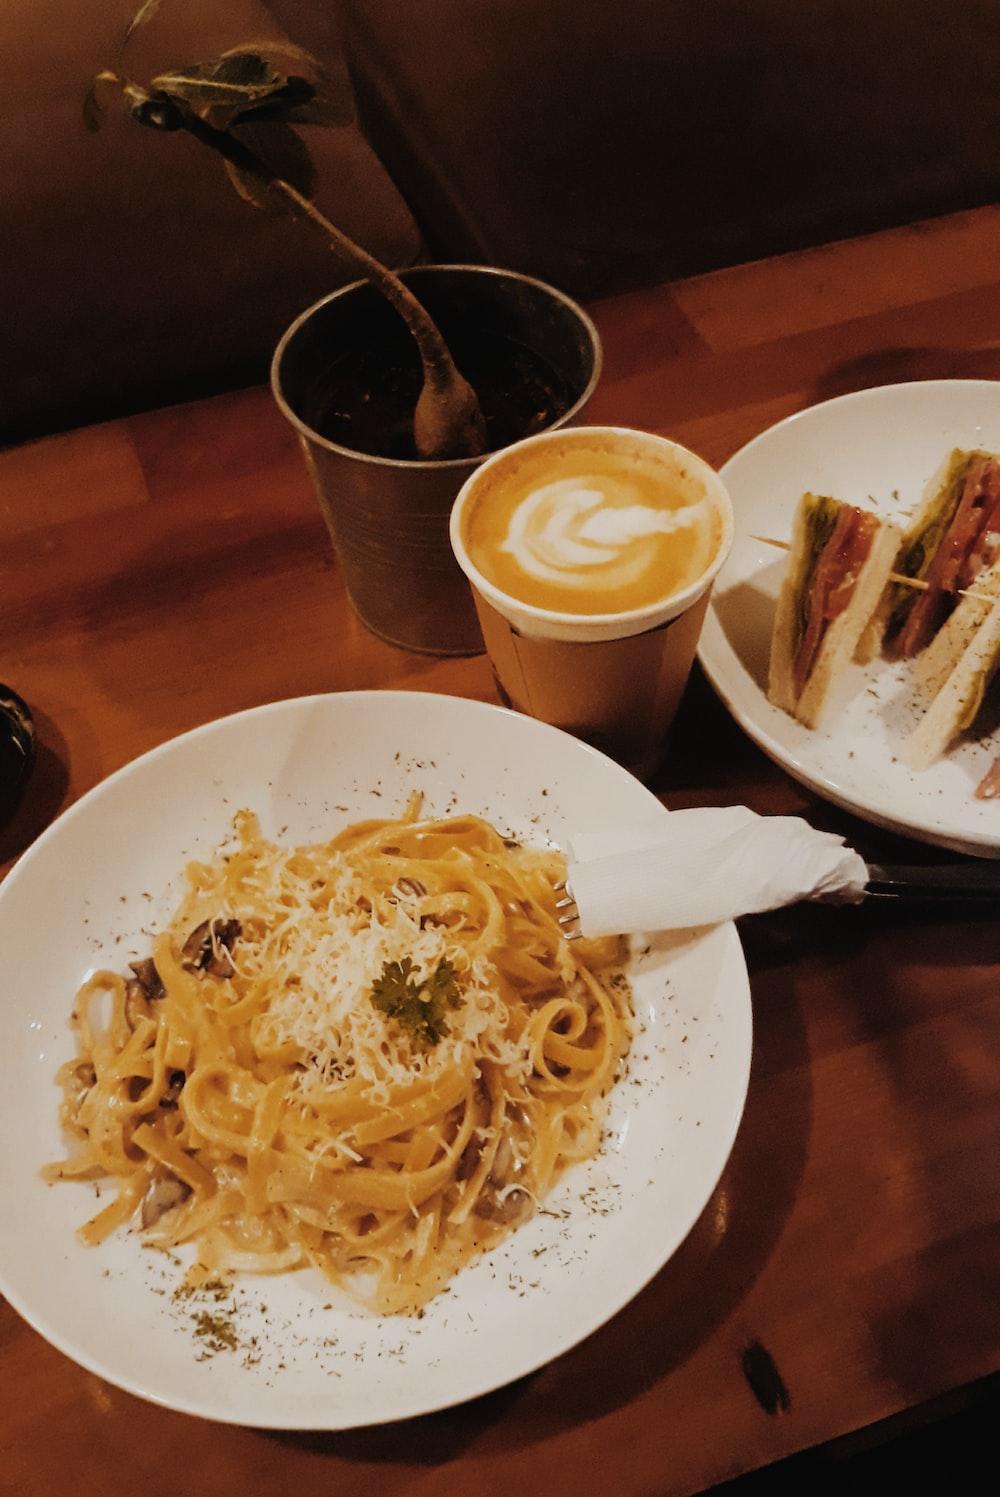 pasta on plate beside latte